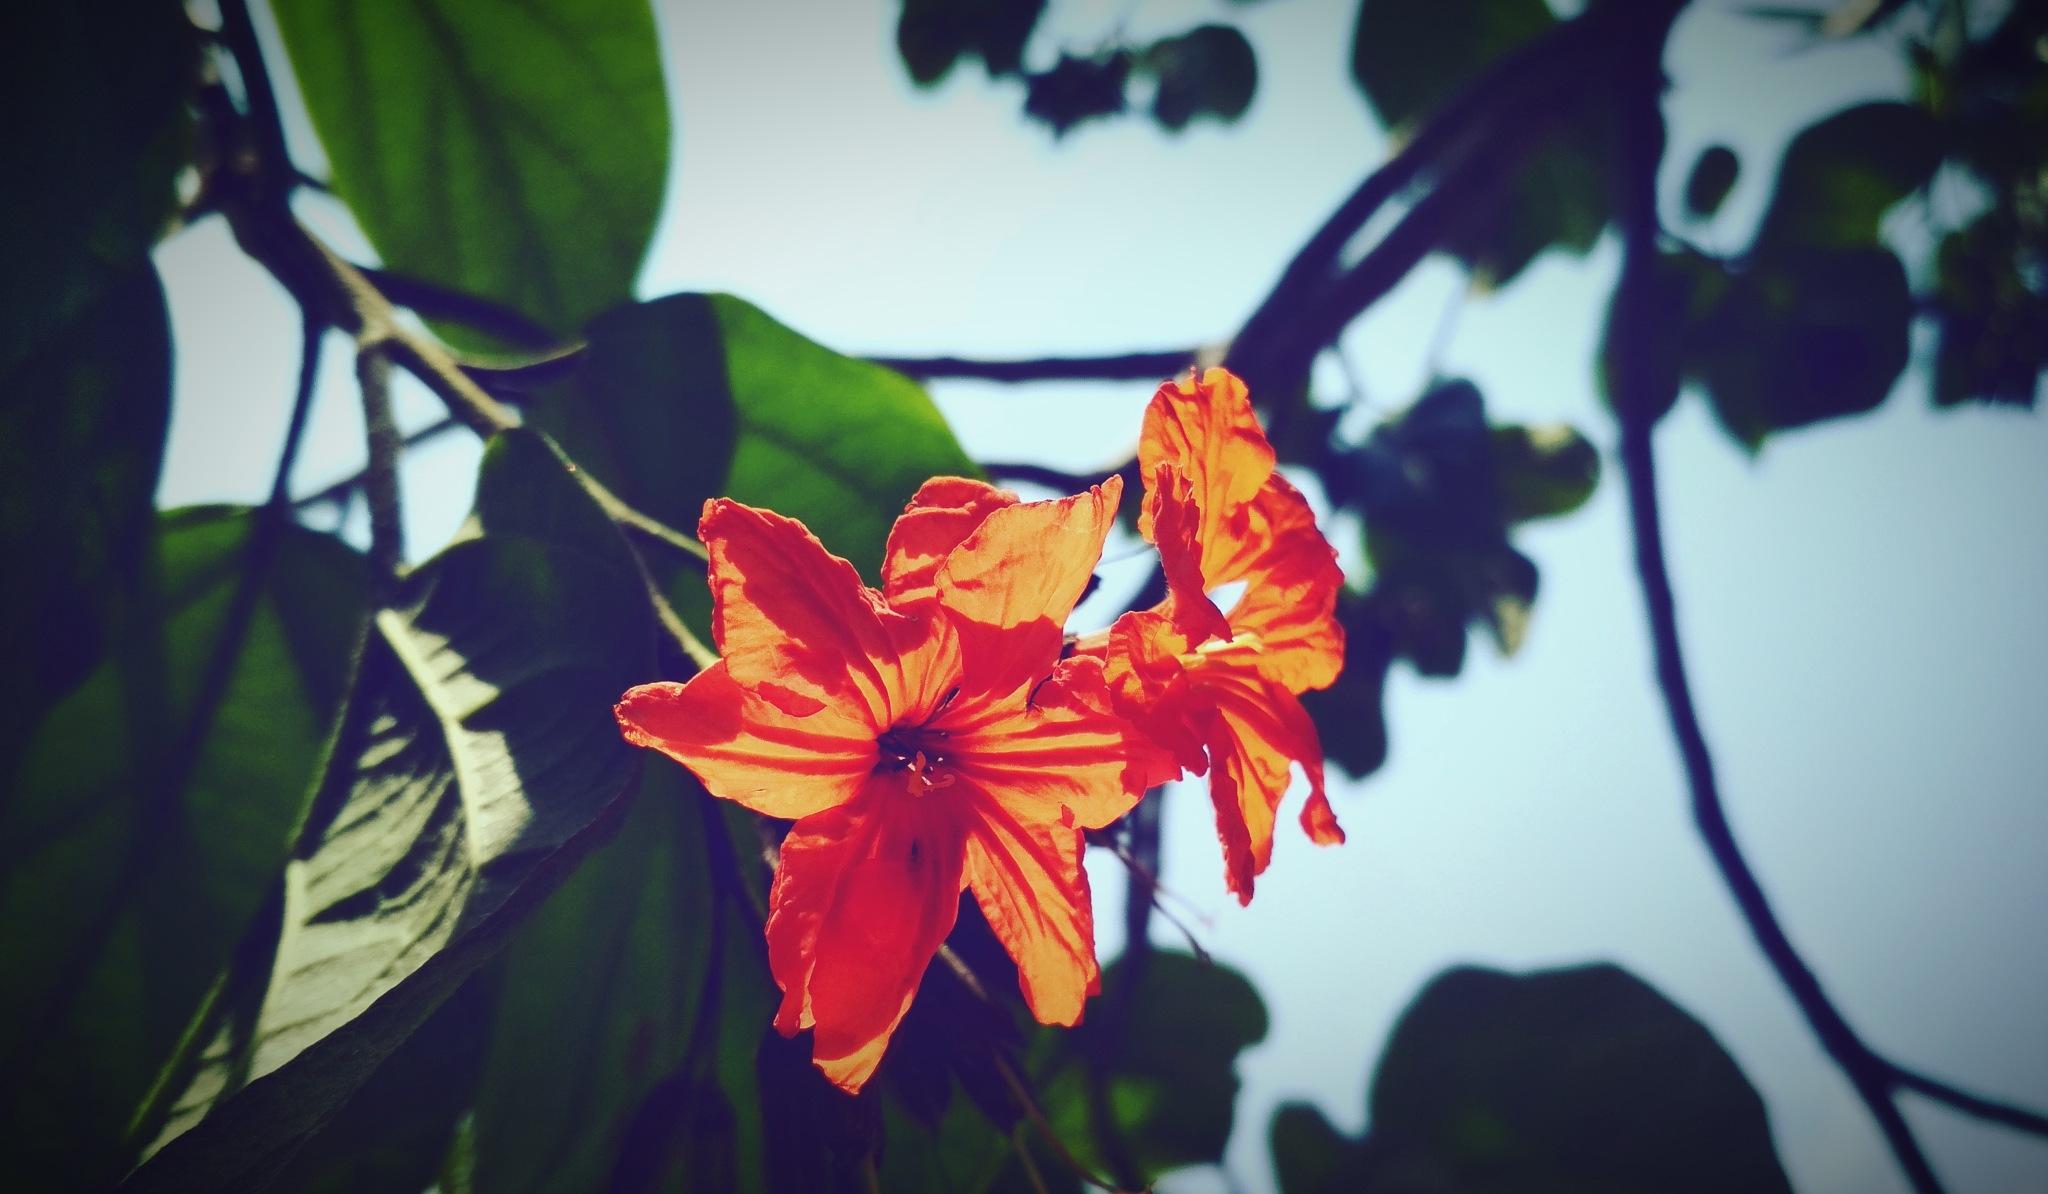 sunshine on flower  by Mahesh